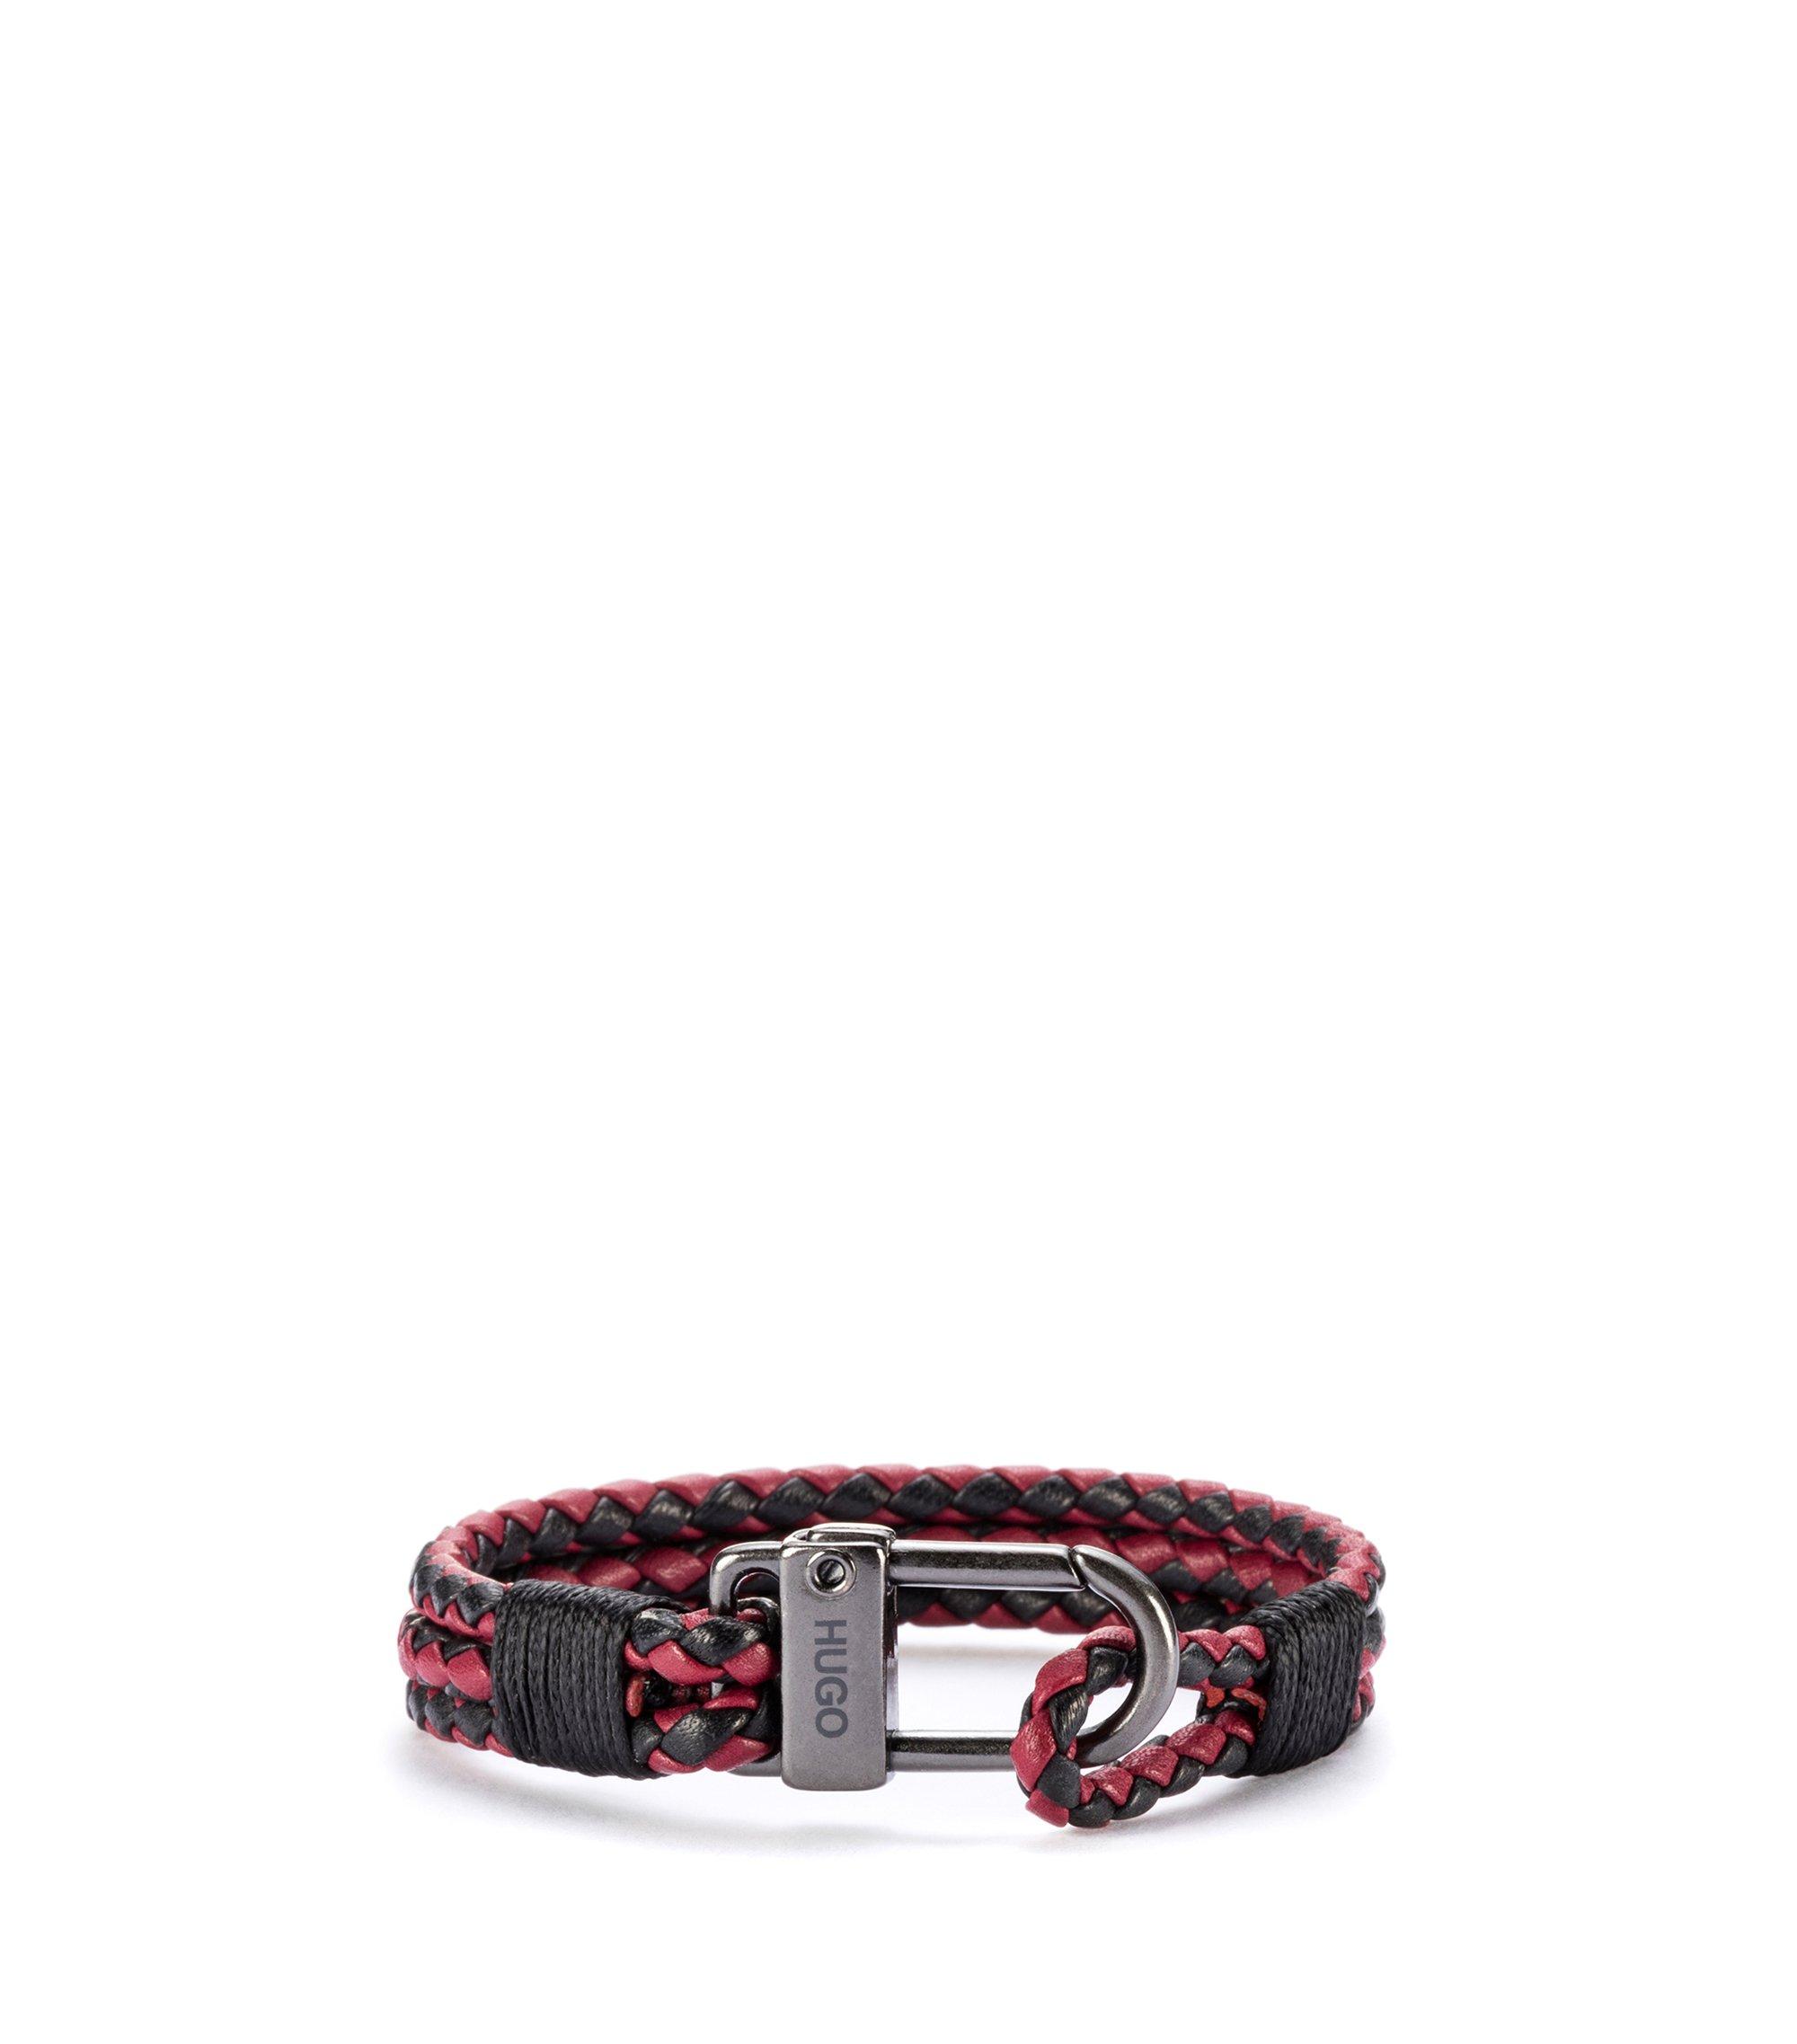 Braided Leather Bracelet | E-Hook, Patterned